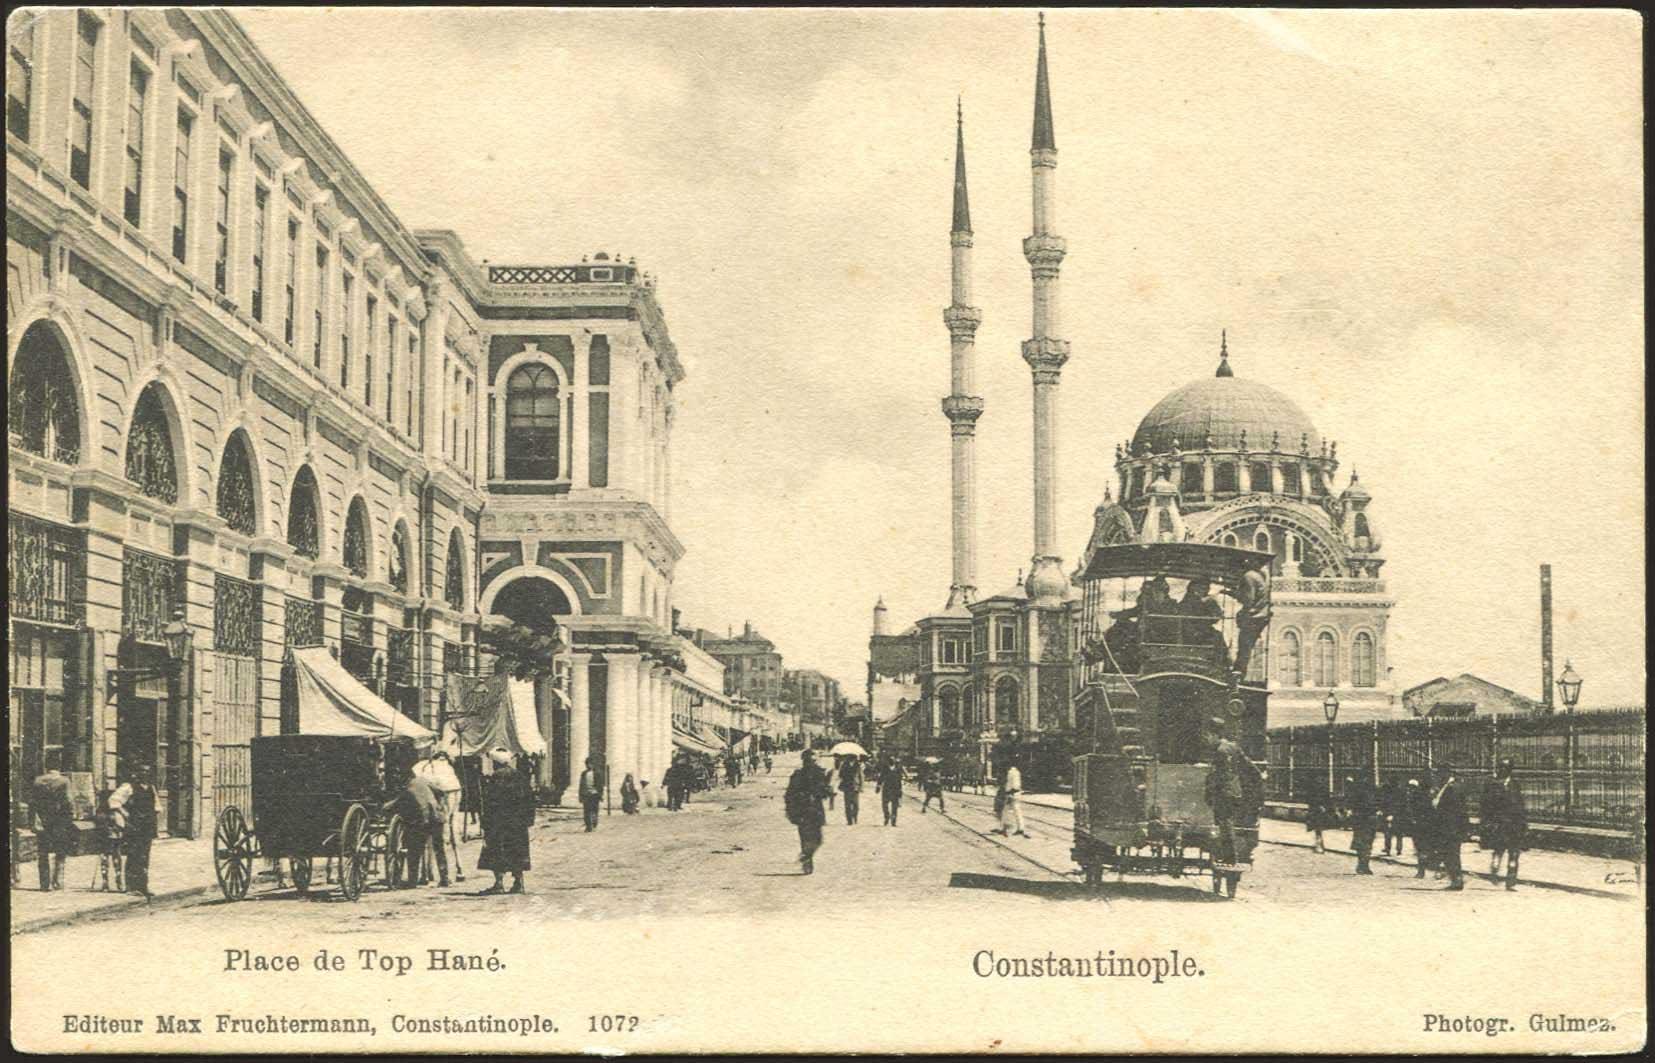 Lot 1798 - -  PICTURE POSTCARDS SMYRNE, CONSTANTINOPLE, ASIA MINOR -  A. Karamitsos Postal & Live Internet Auction 677